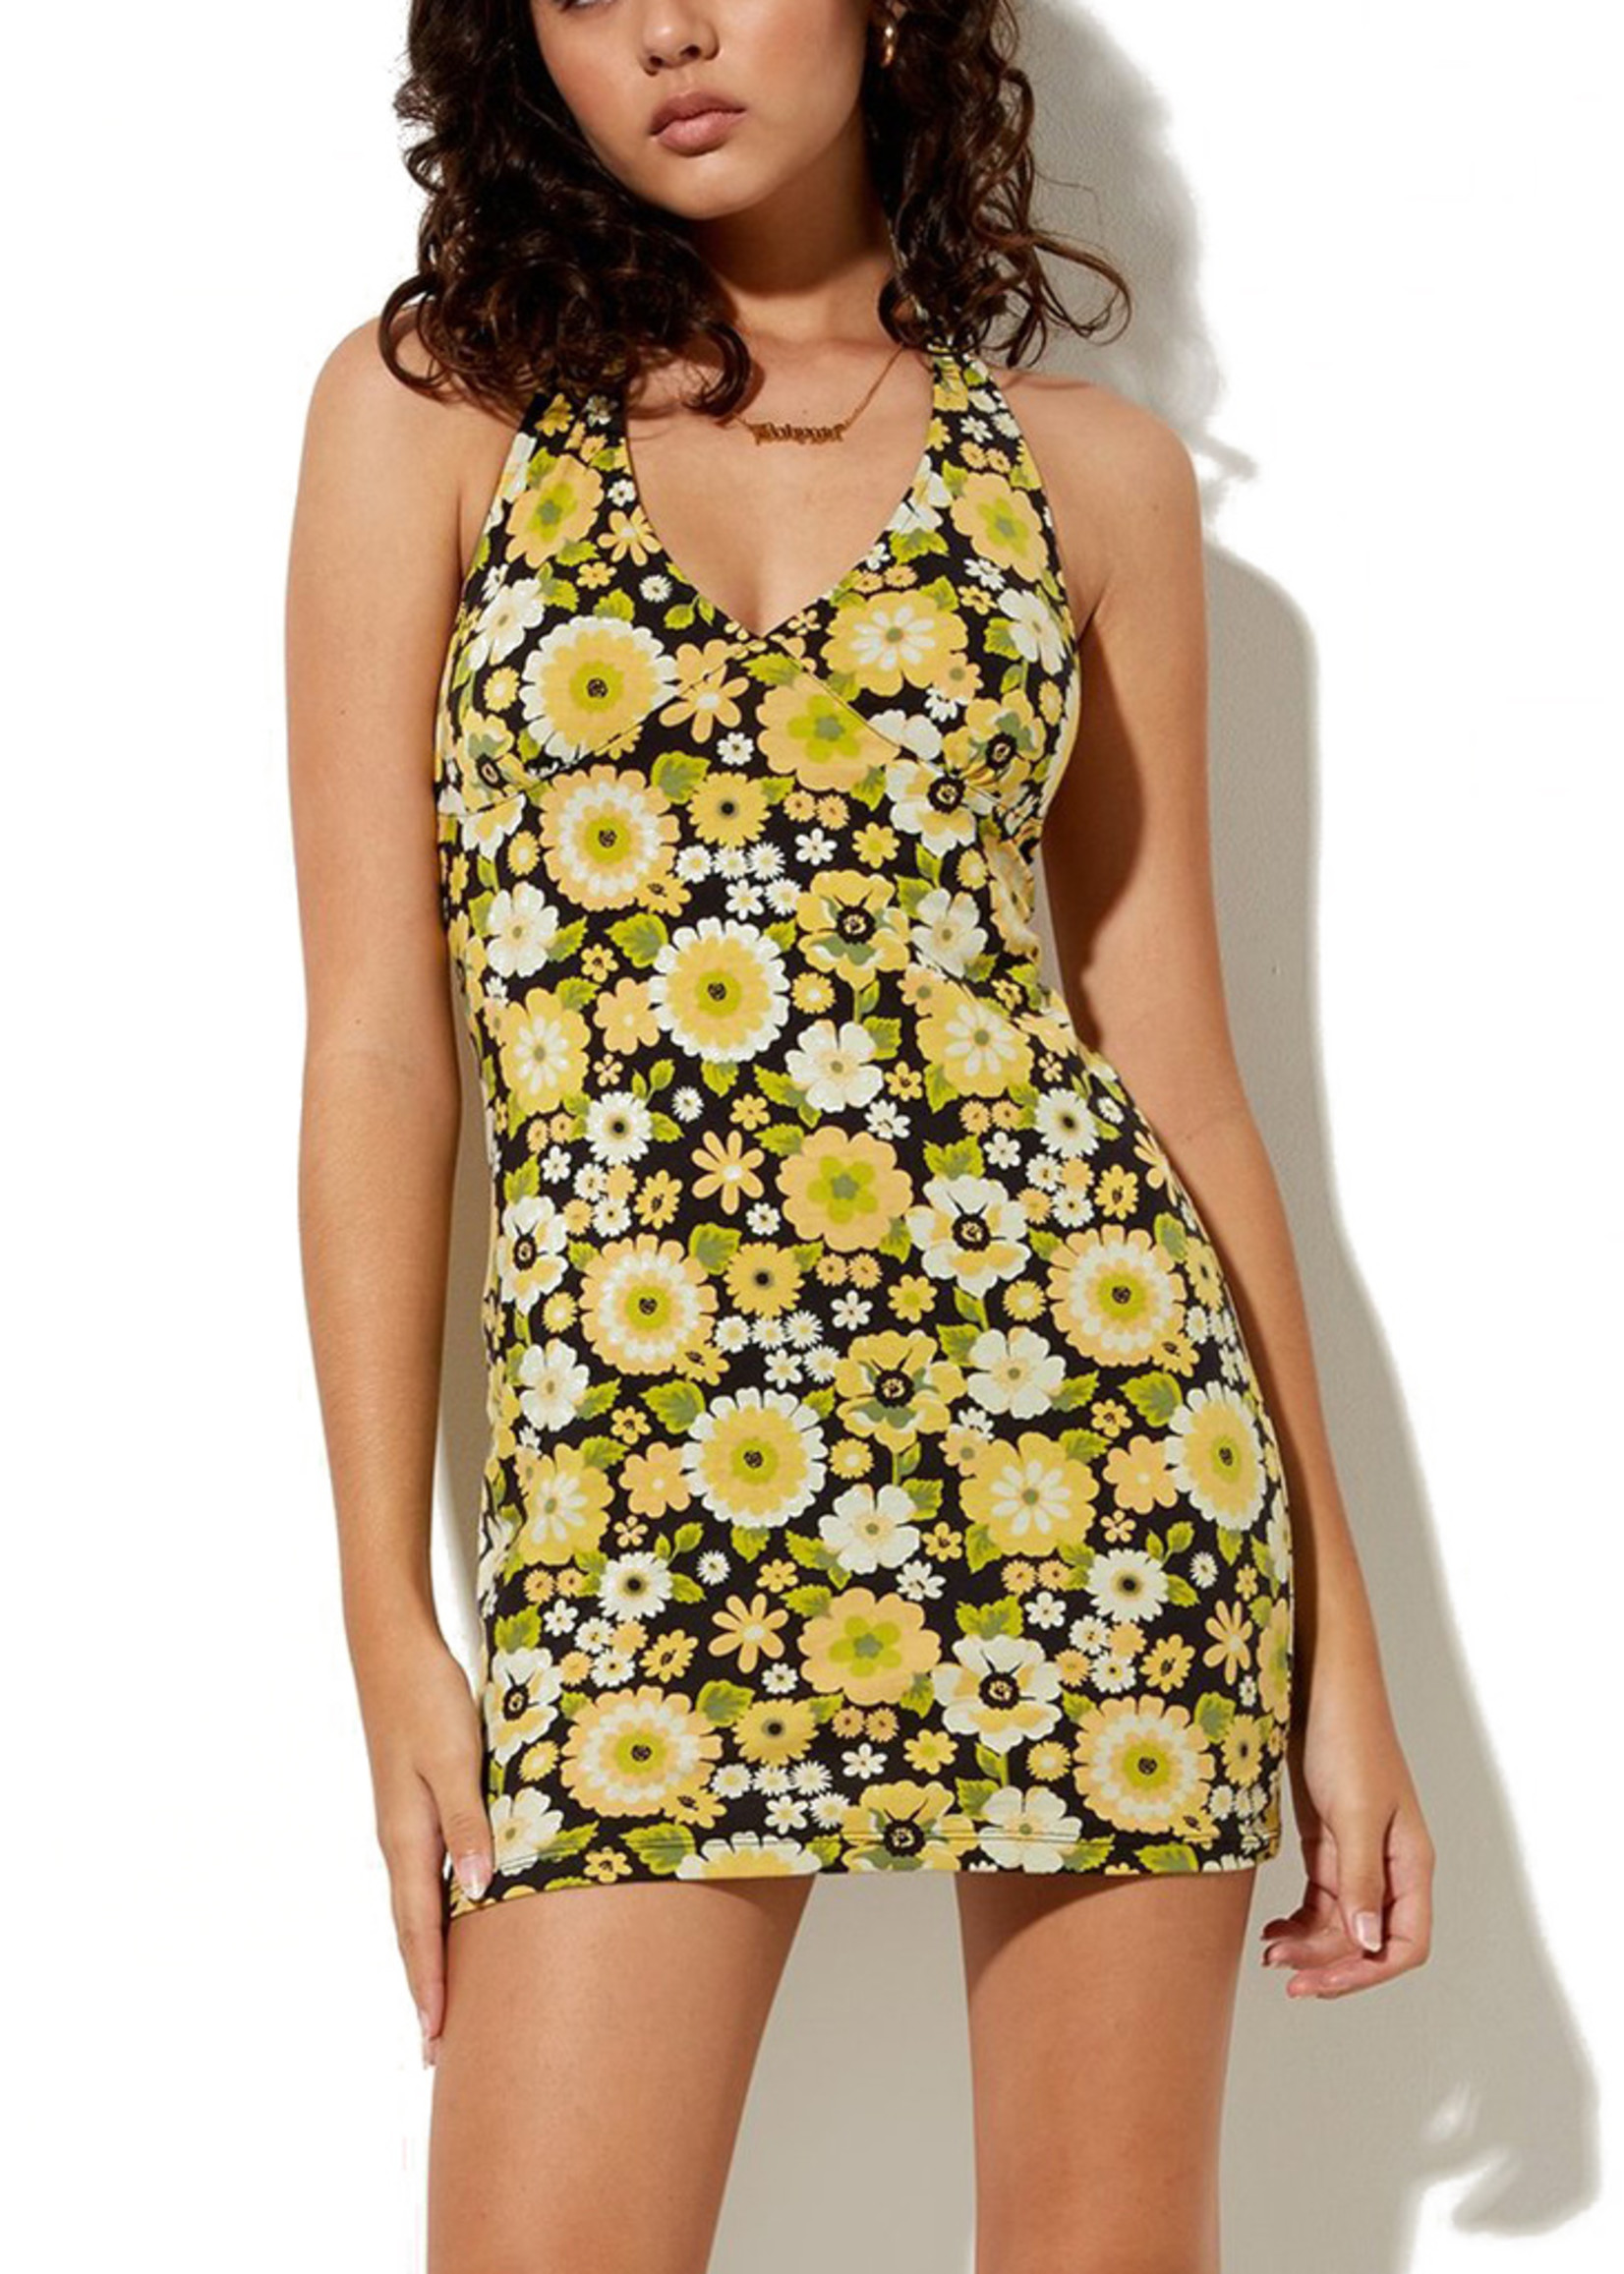 MOTEL MOTEL / Yvette Dress Retro Floral